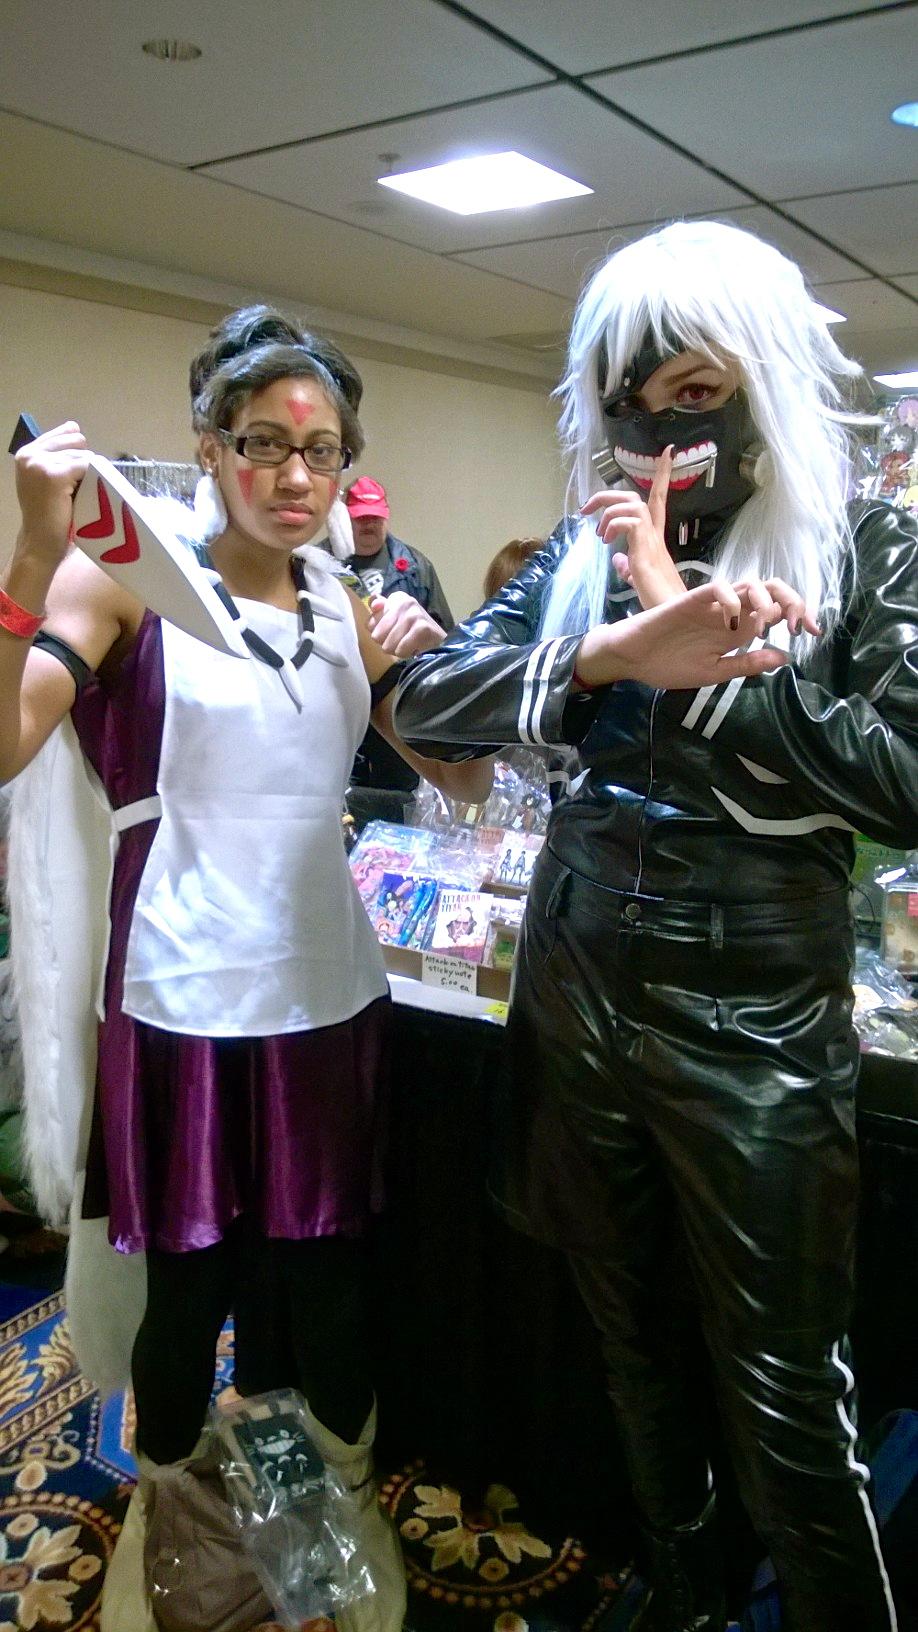 Princess Mononoke & Kaneki from Tokyo Ghoul